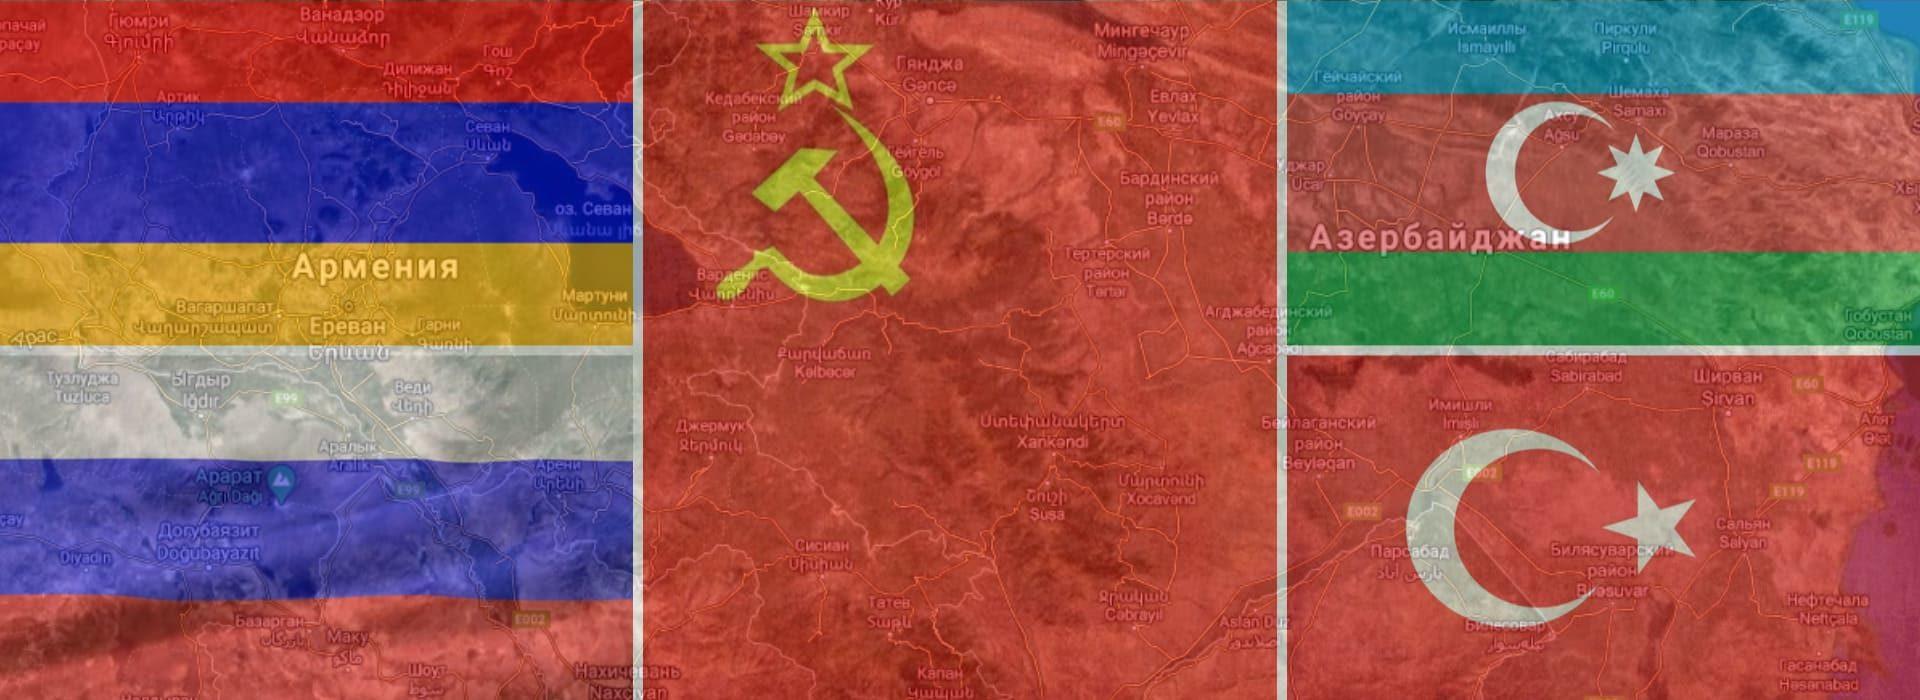 История Карабахского конфликта кратко